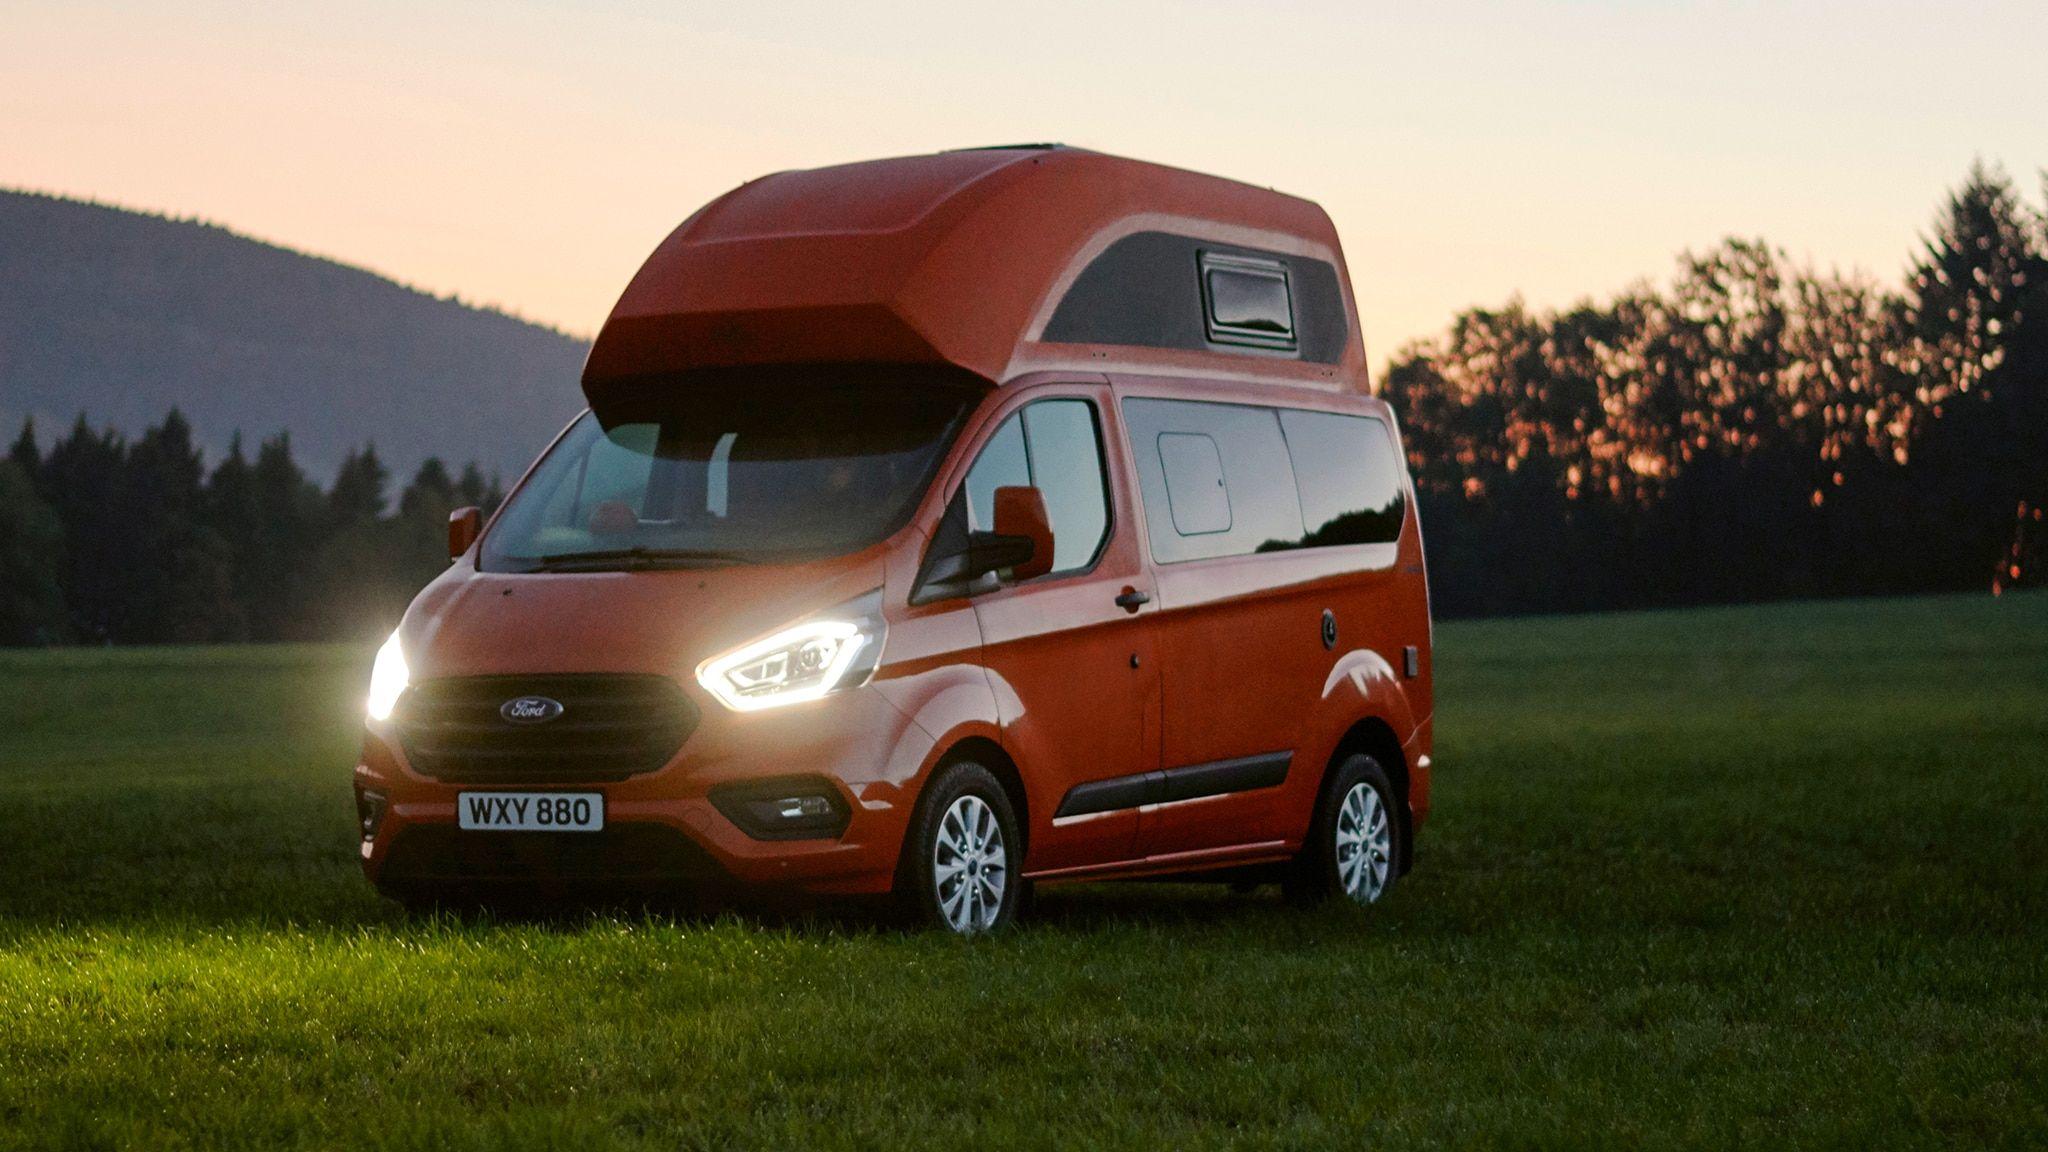 Westfalia Ford Nugget Transit Camper Van Conversion Is Vantastic With Images Ford Transit Transit Custom Camper Van